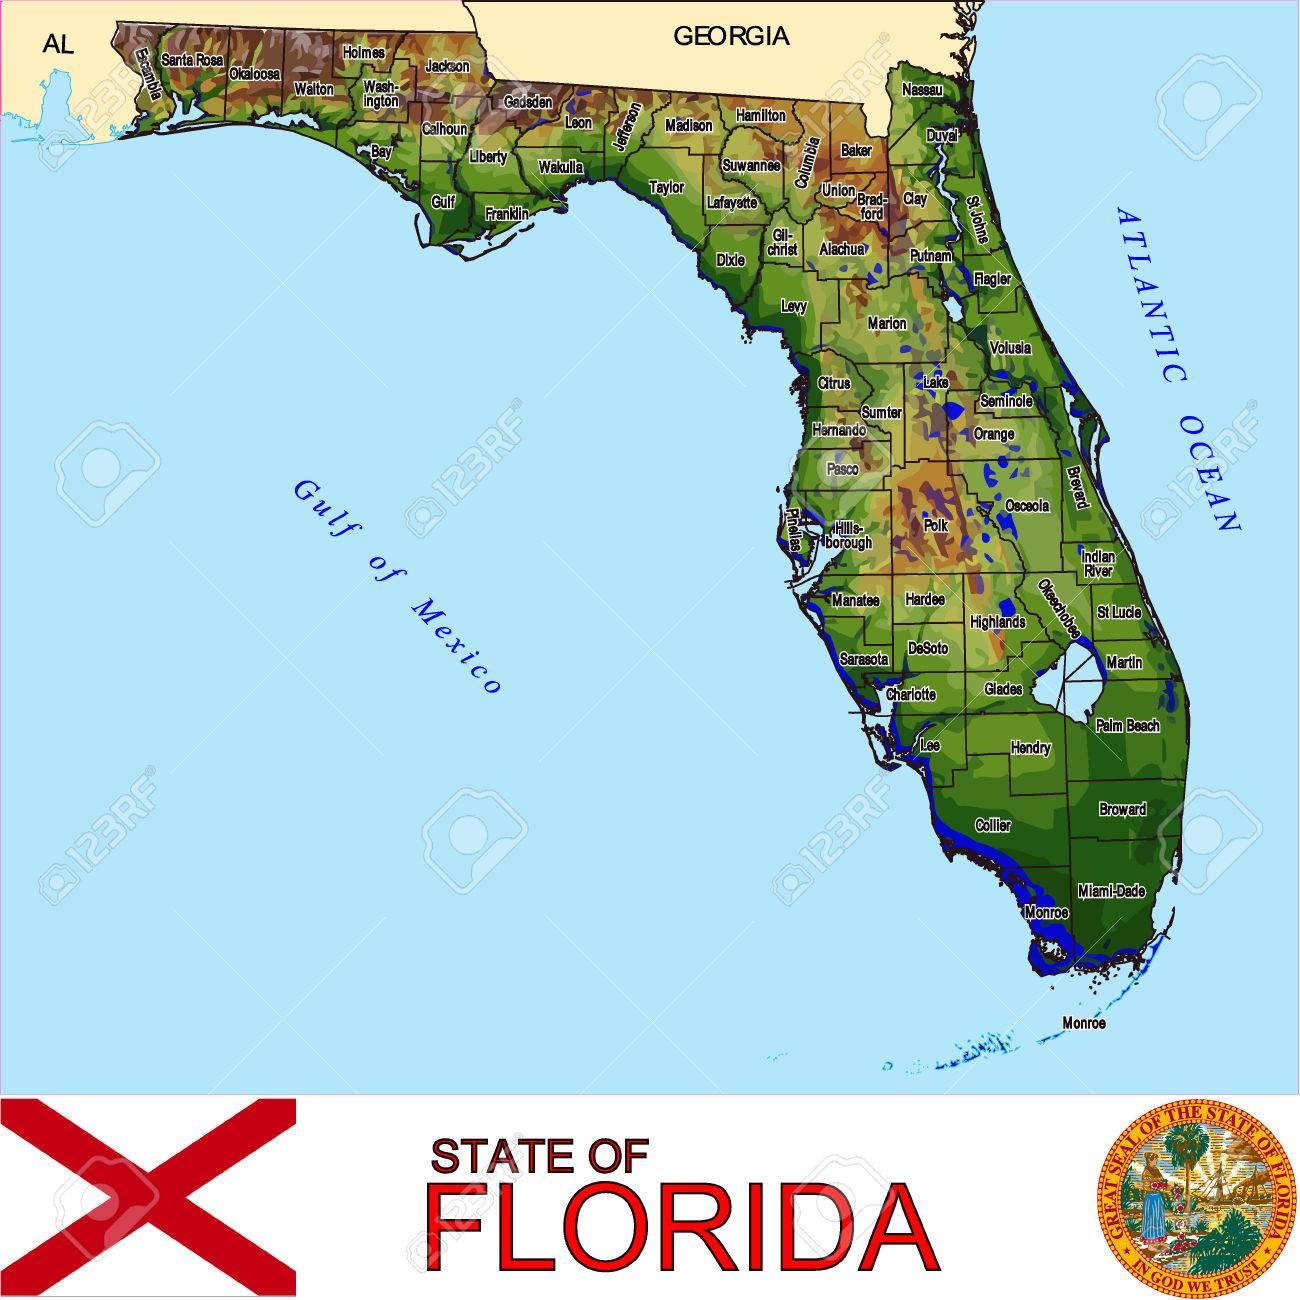 Florida Counties Map Royalty Free Cliparts Vectors And Stock - Florida map vector free